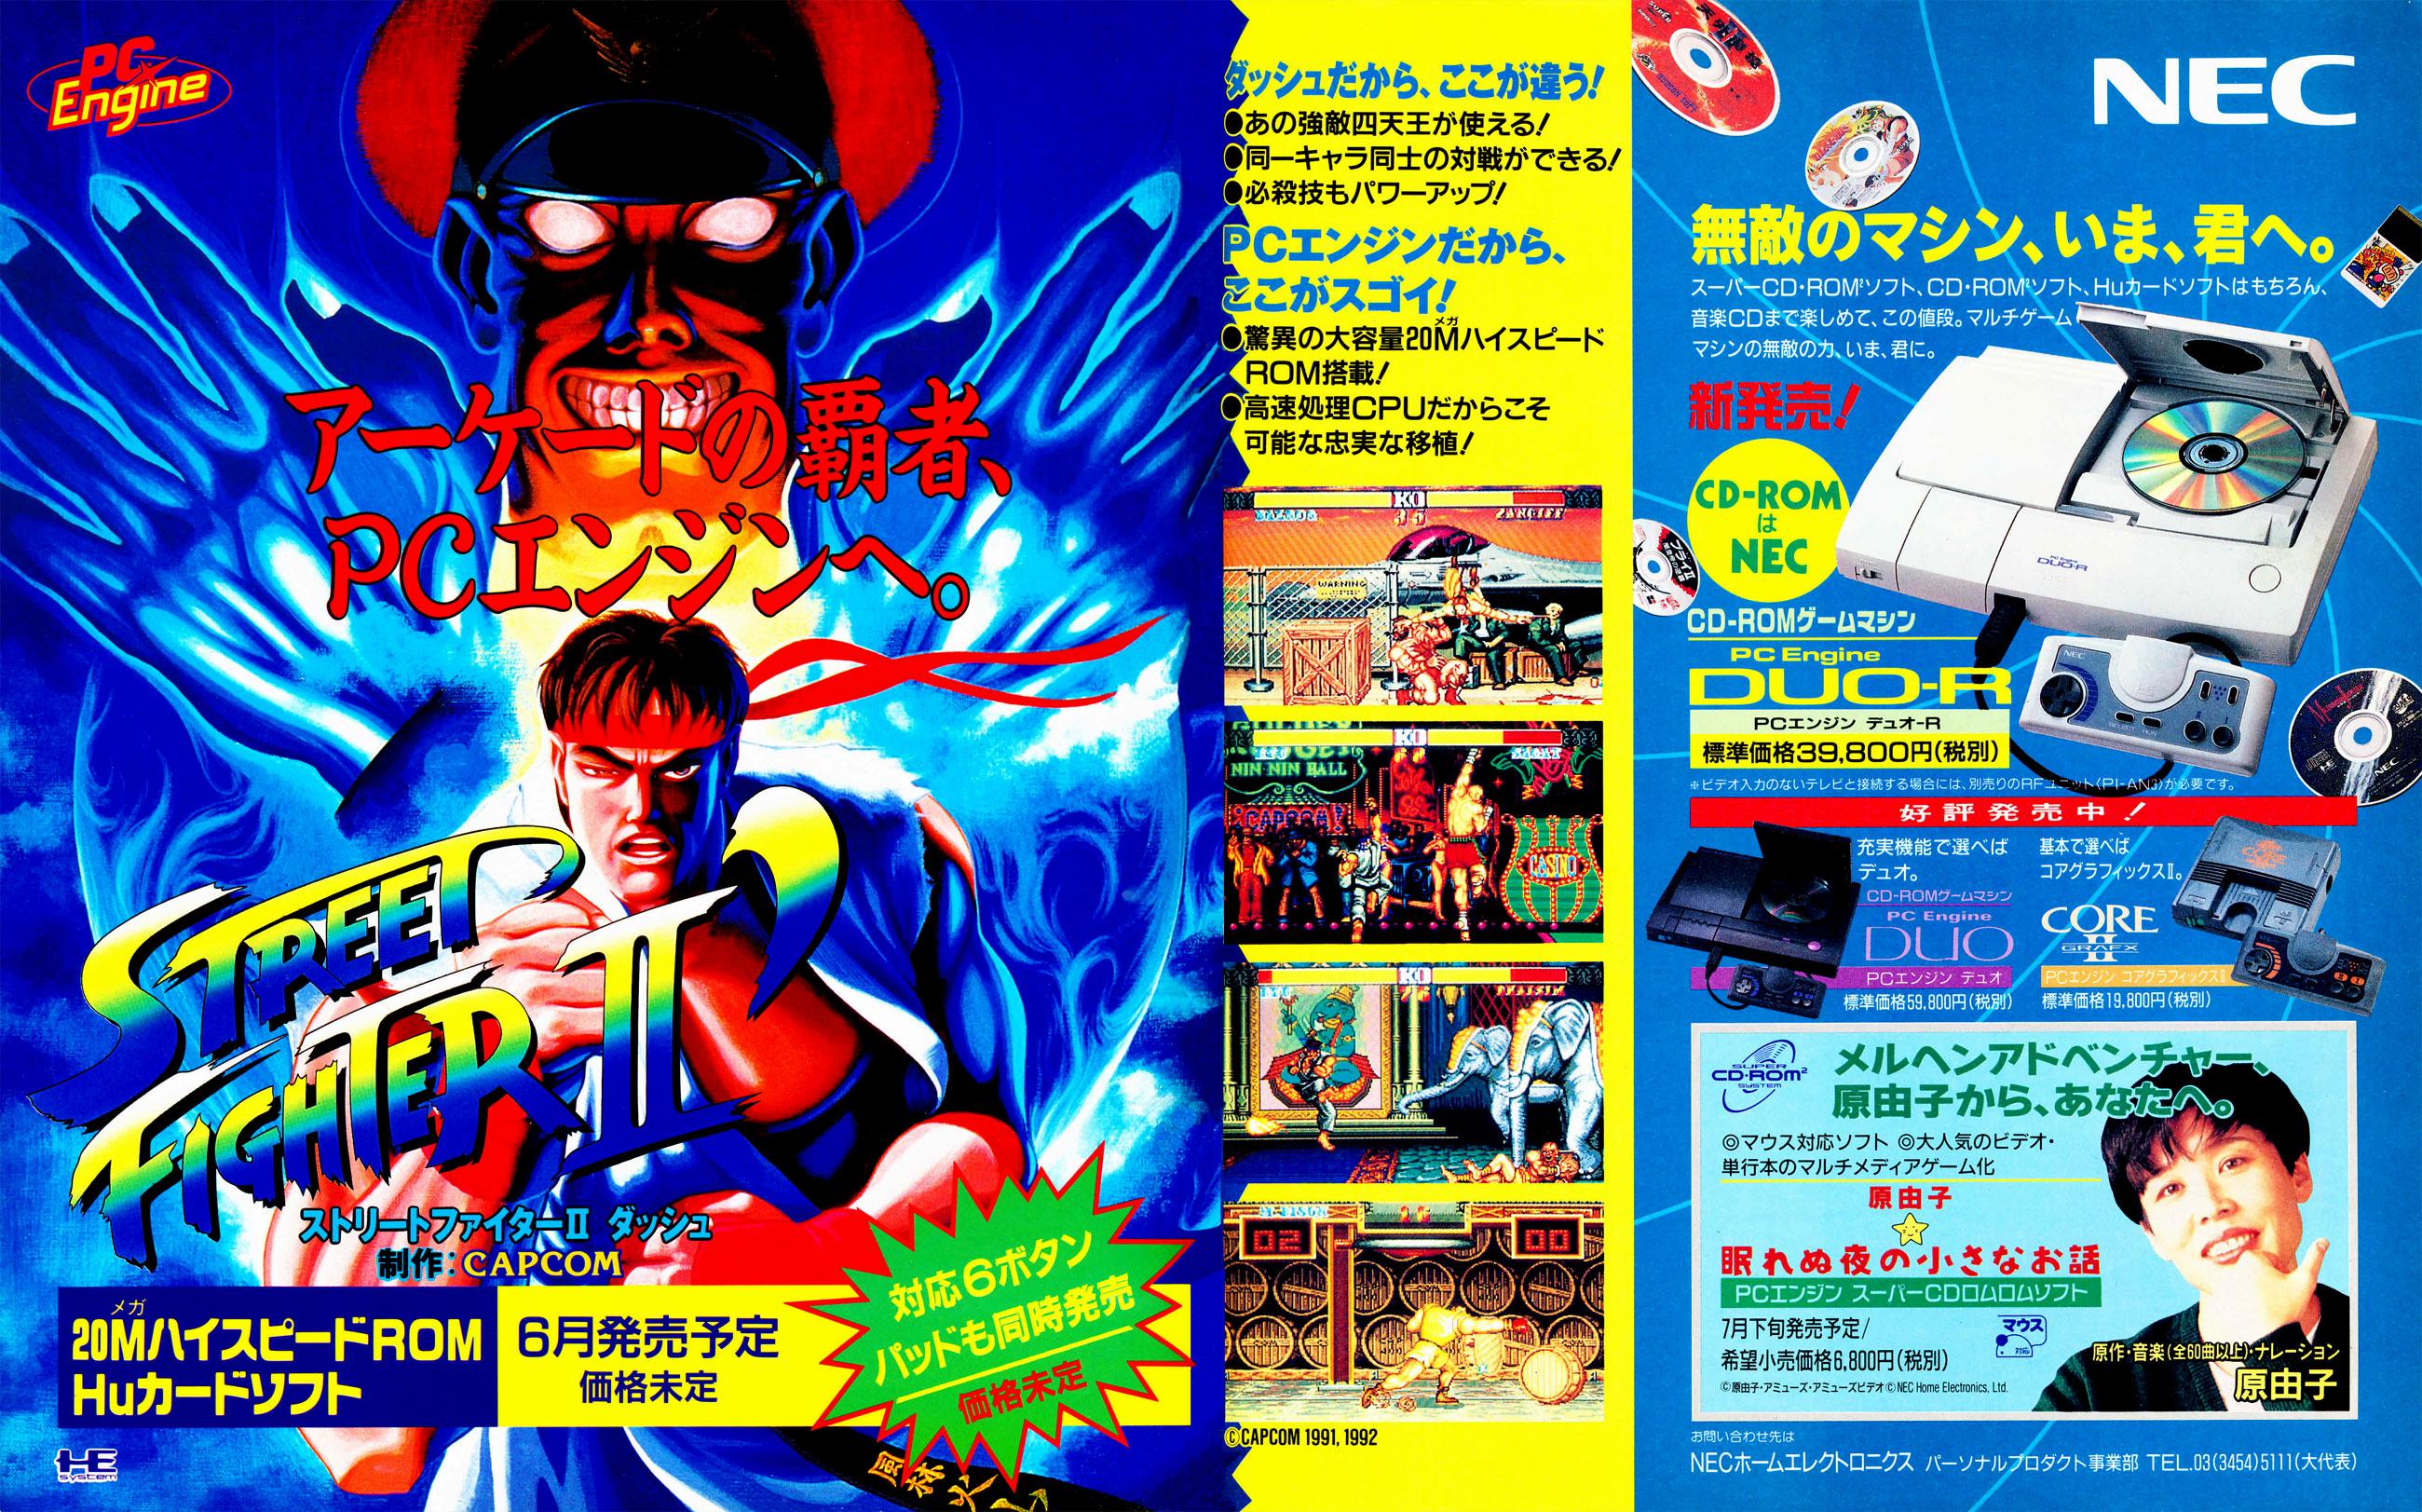 Gekkan PC Engine #05 (May 1993) :: TurboPlay Magazine Archives